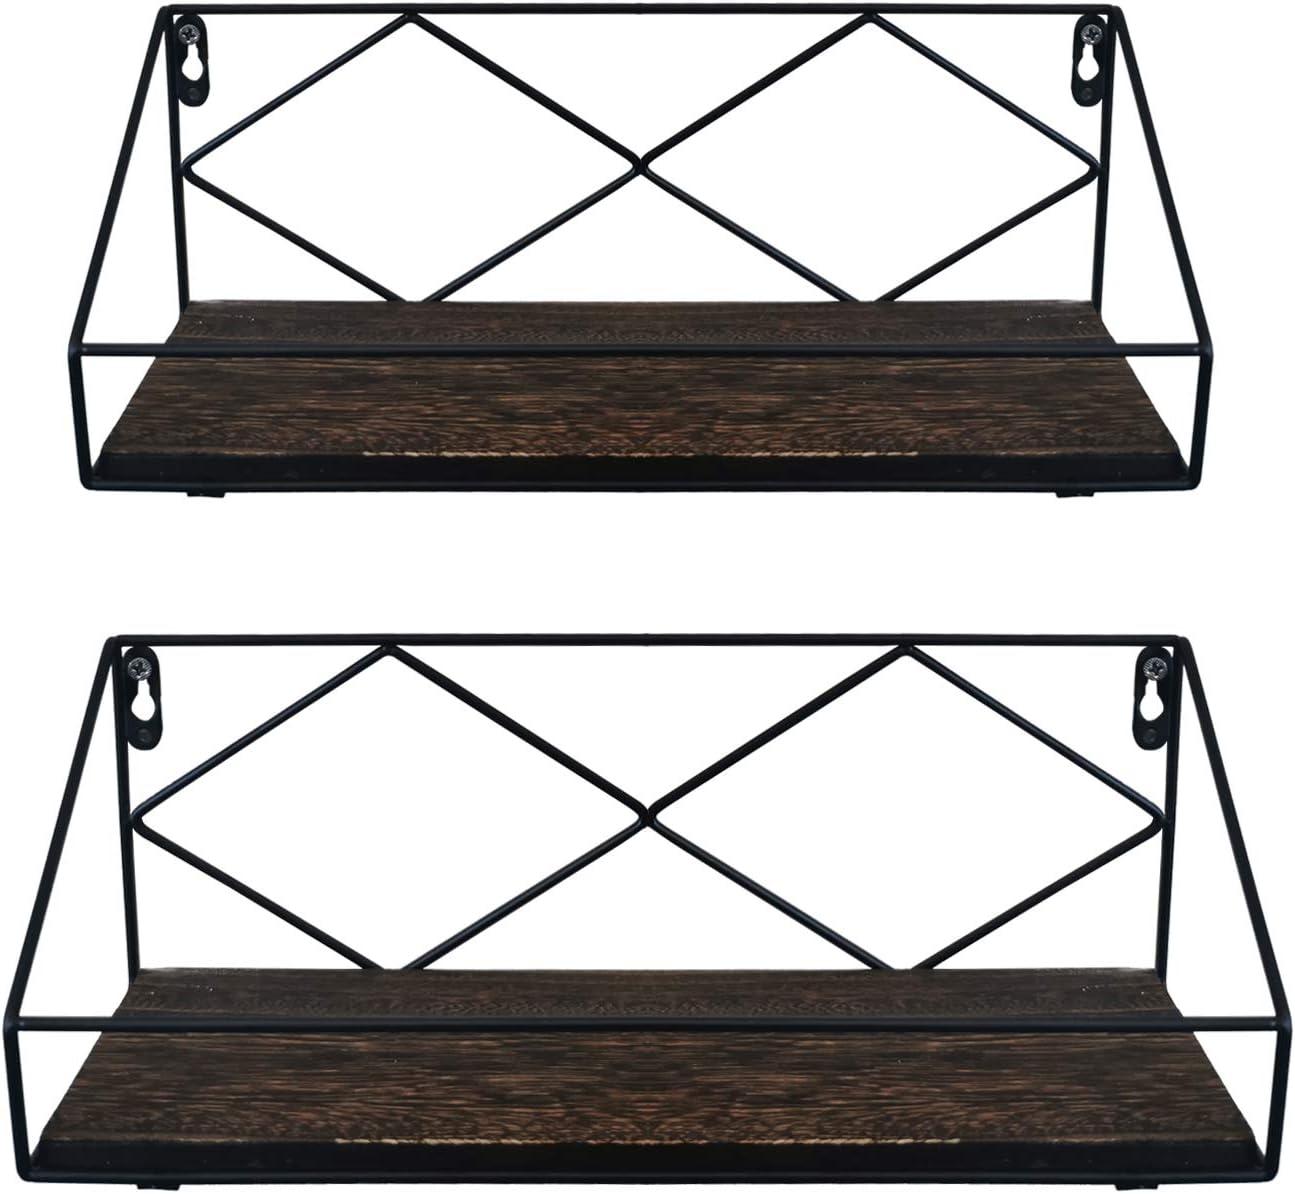 BESCRCL Floating Shelves Wall Mounted Rustic Wood, Storage Shelves Set of 2 for Kitchen, Bathroom, Living Room, Bedroom